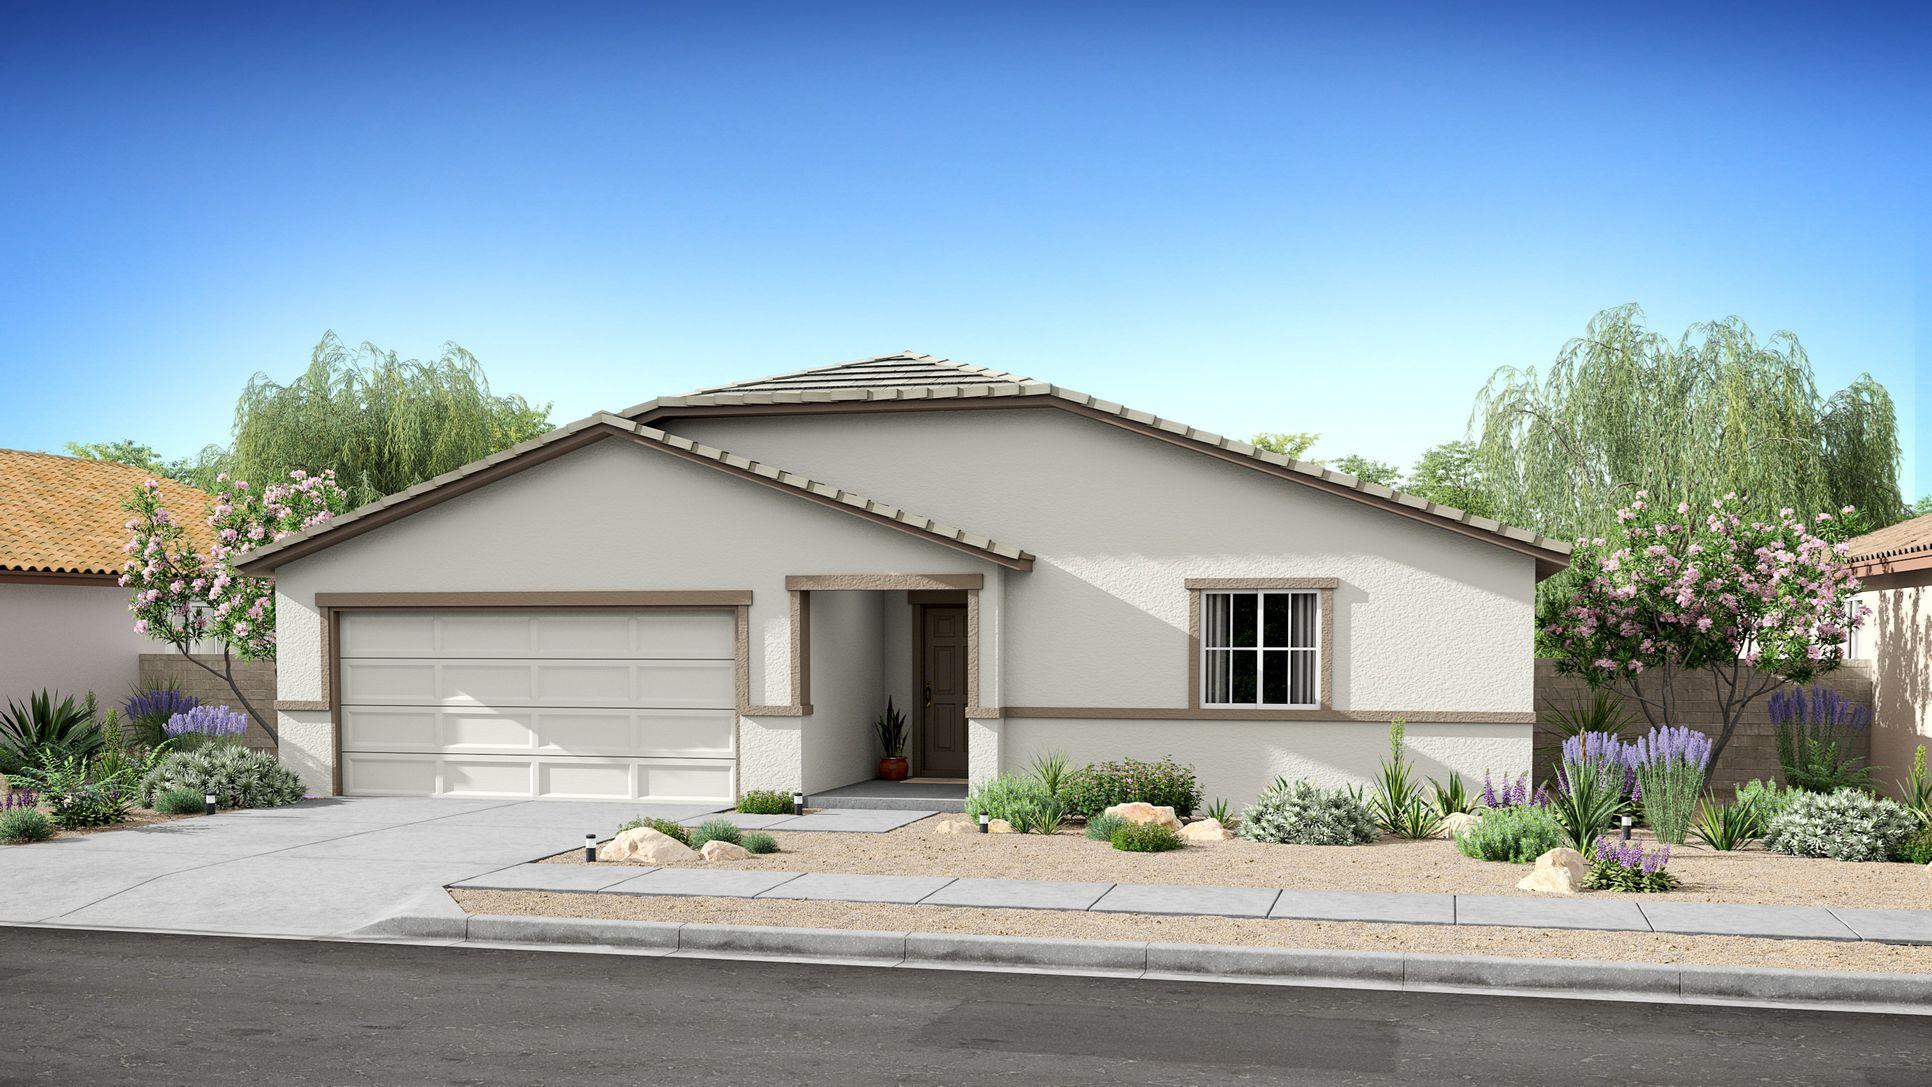 4561 salto c new homes aspire at adelanto